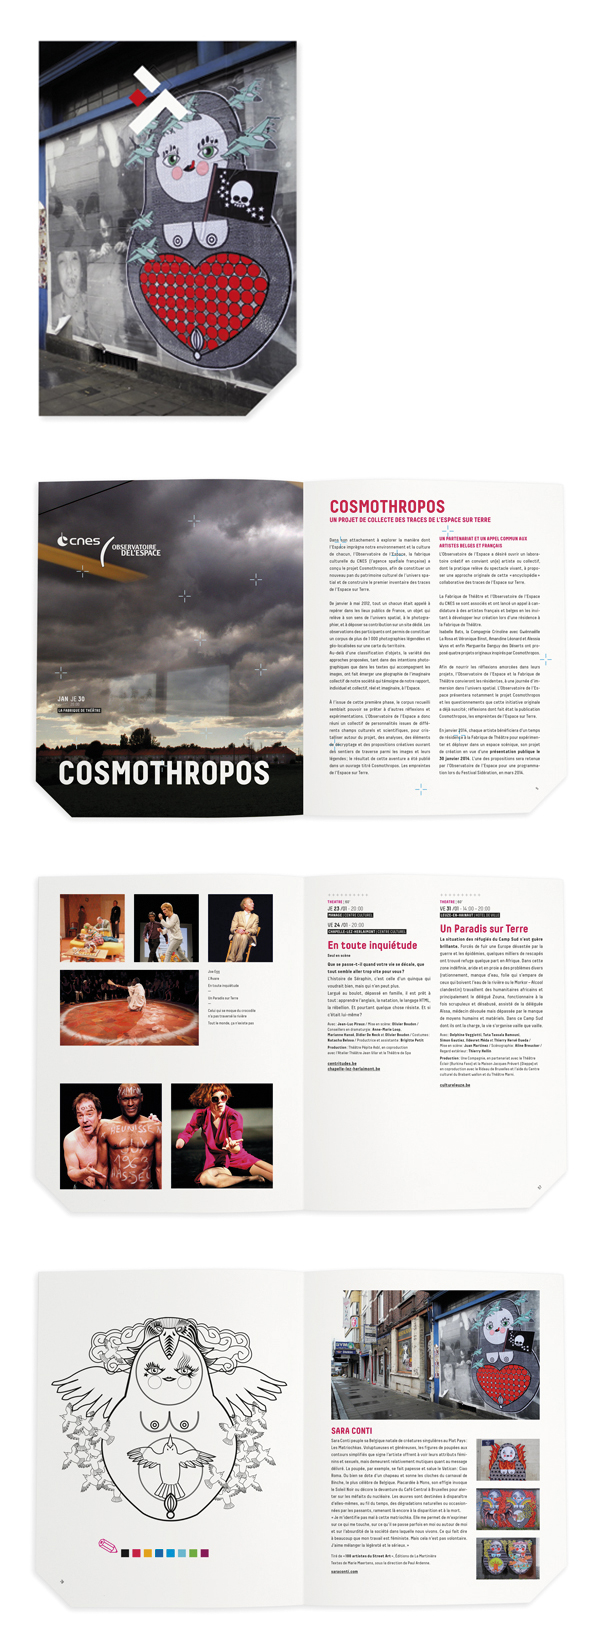 La Fabrique de Théâtre <em> – brochure 2014 </em>